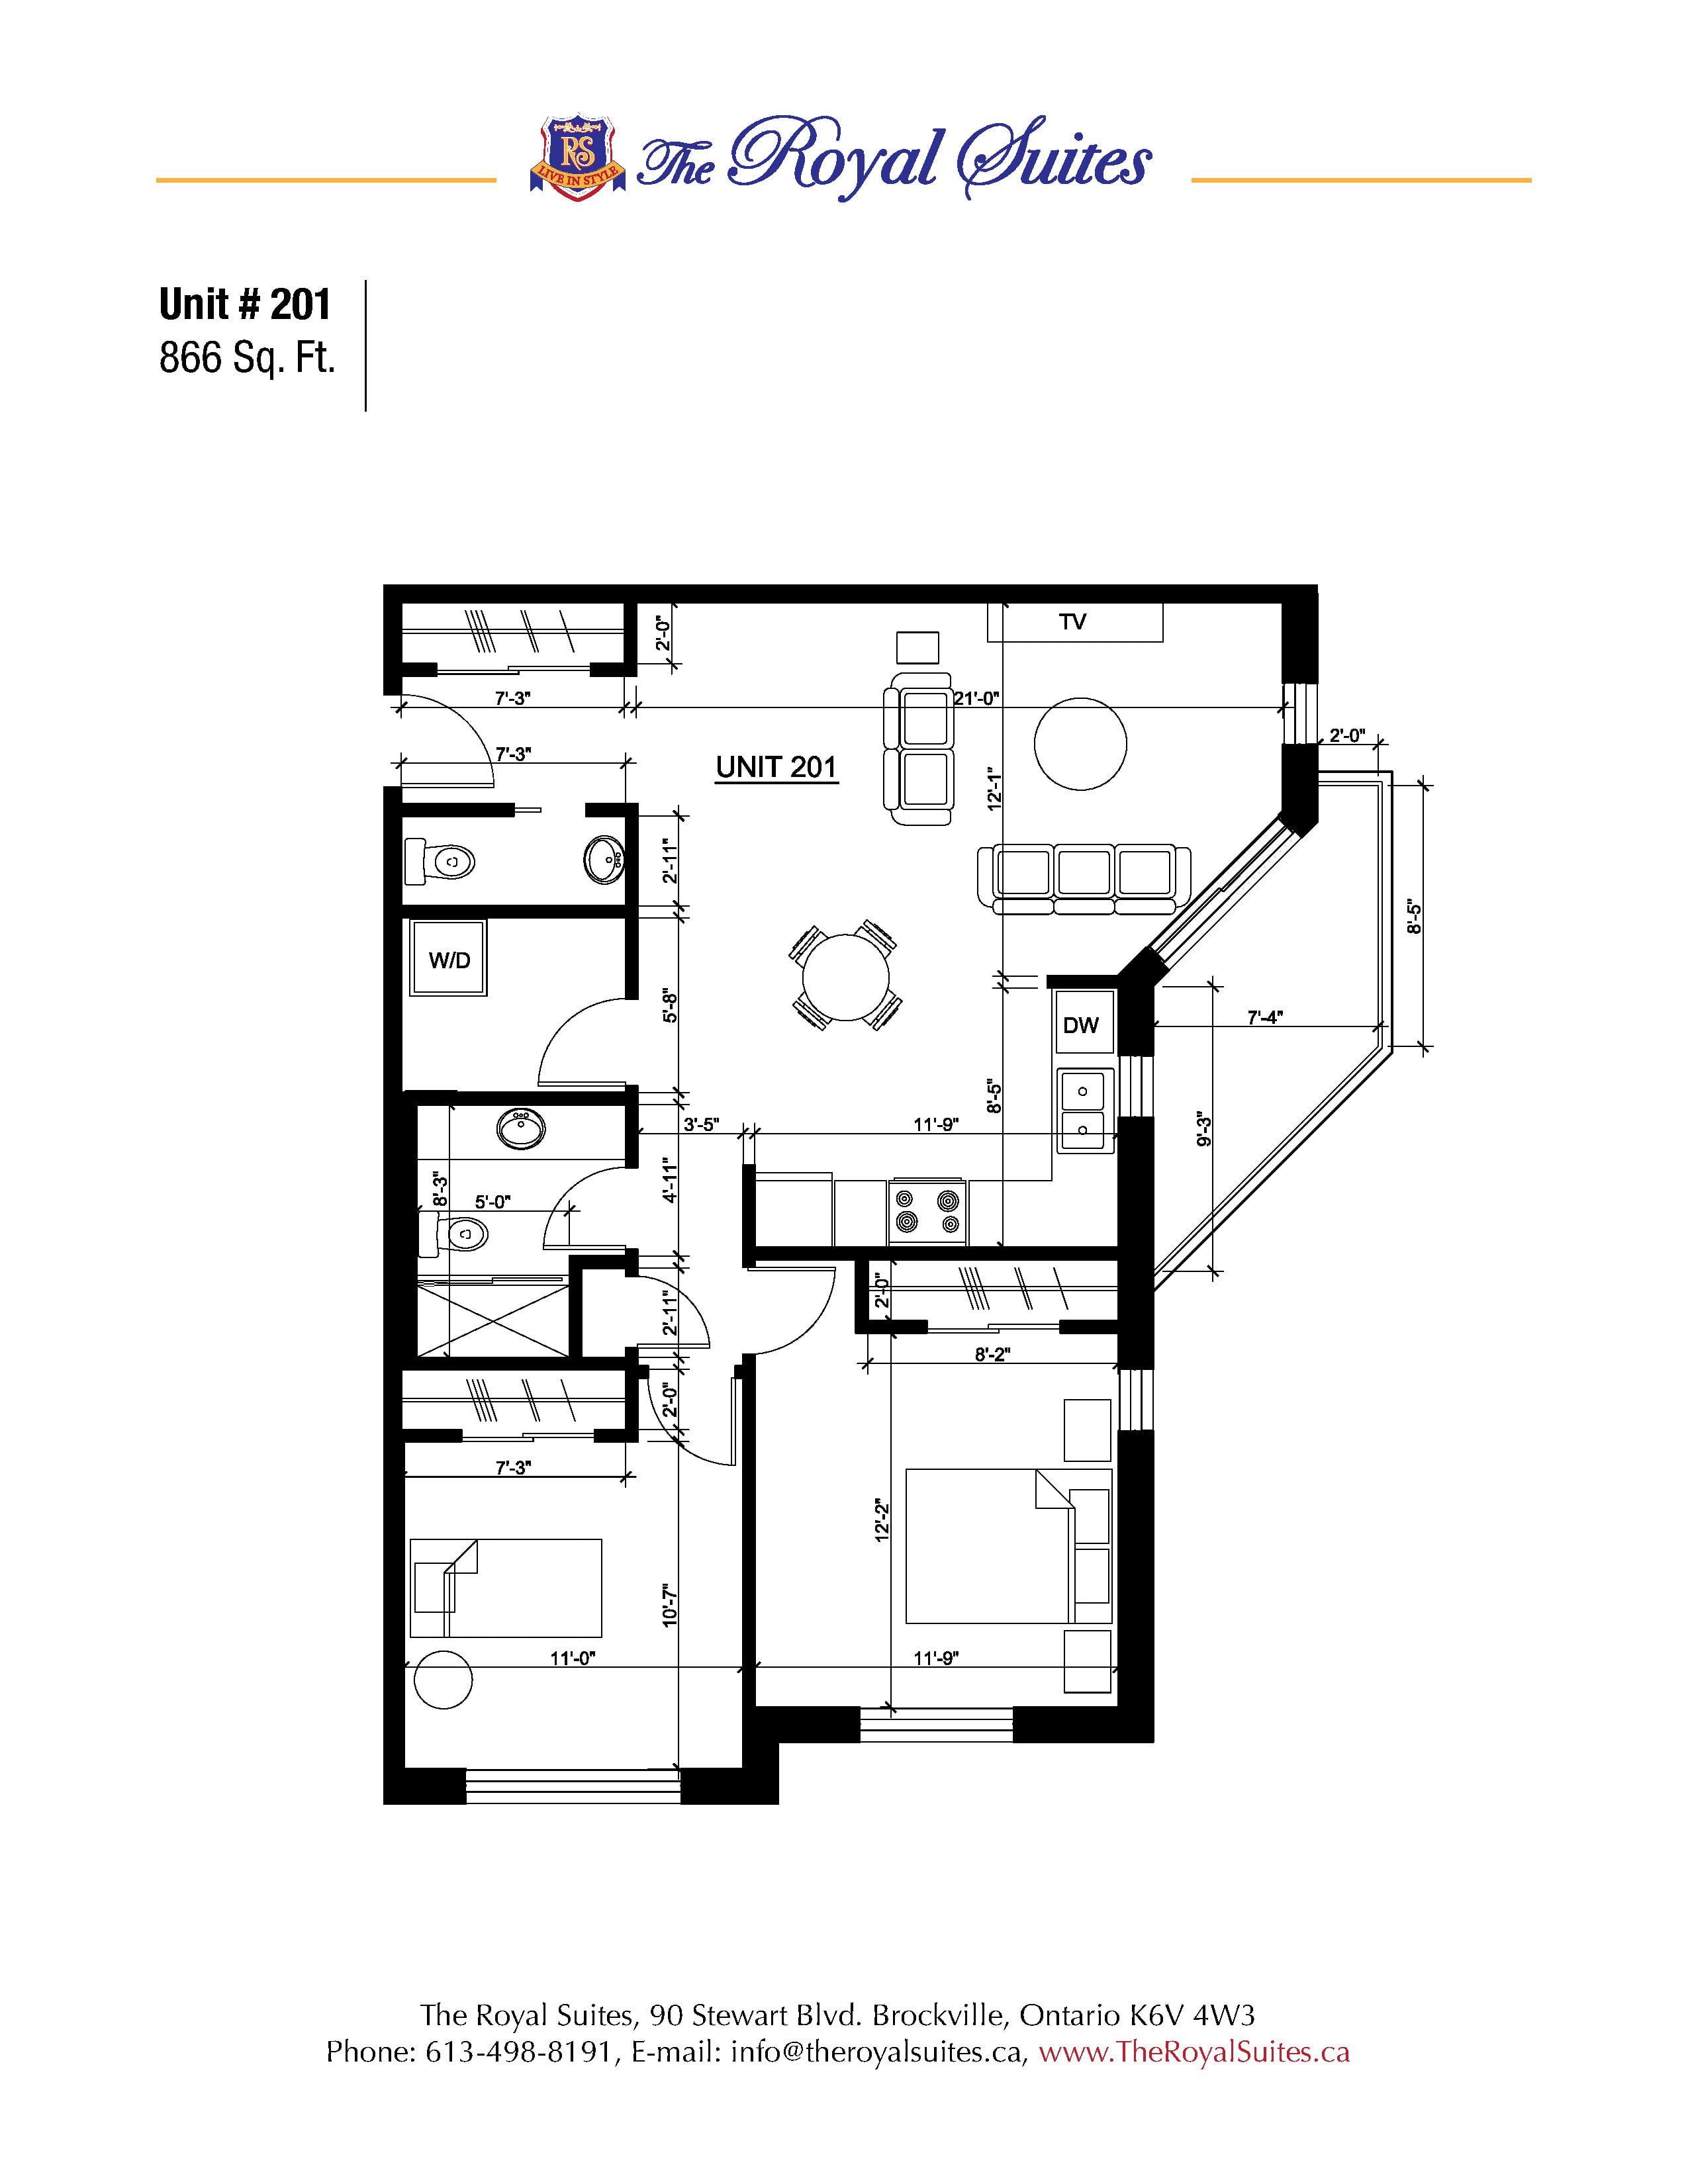 8 Floor Plans Lowres_1_1